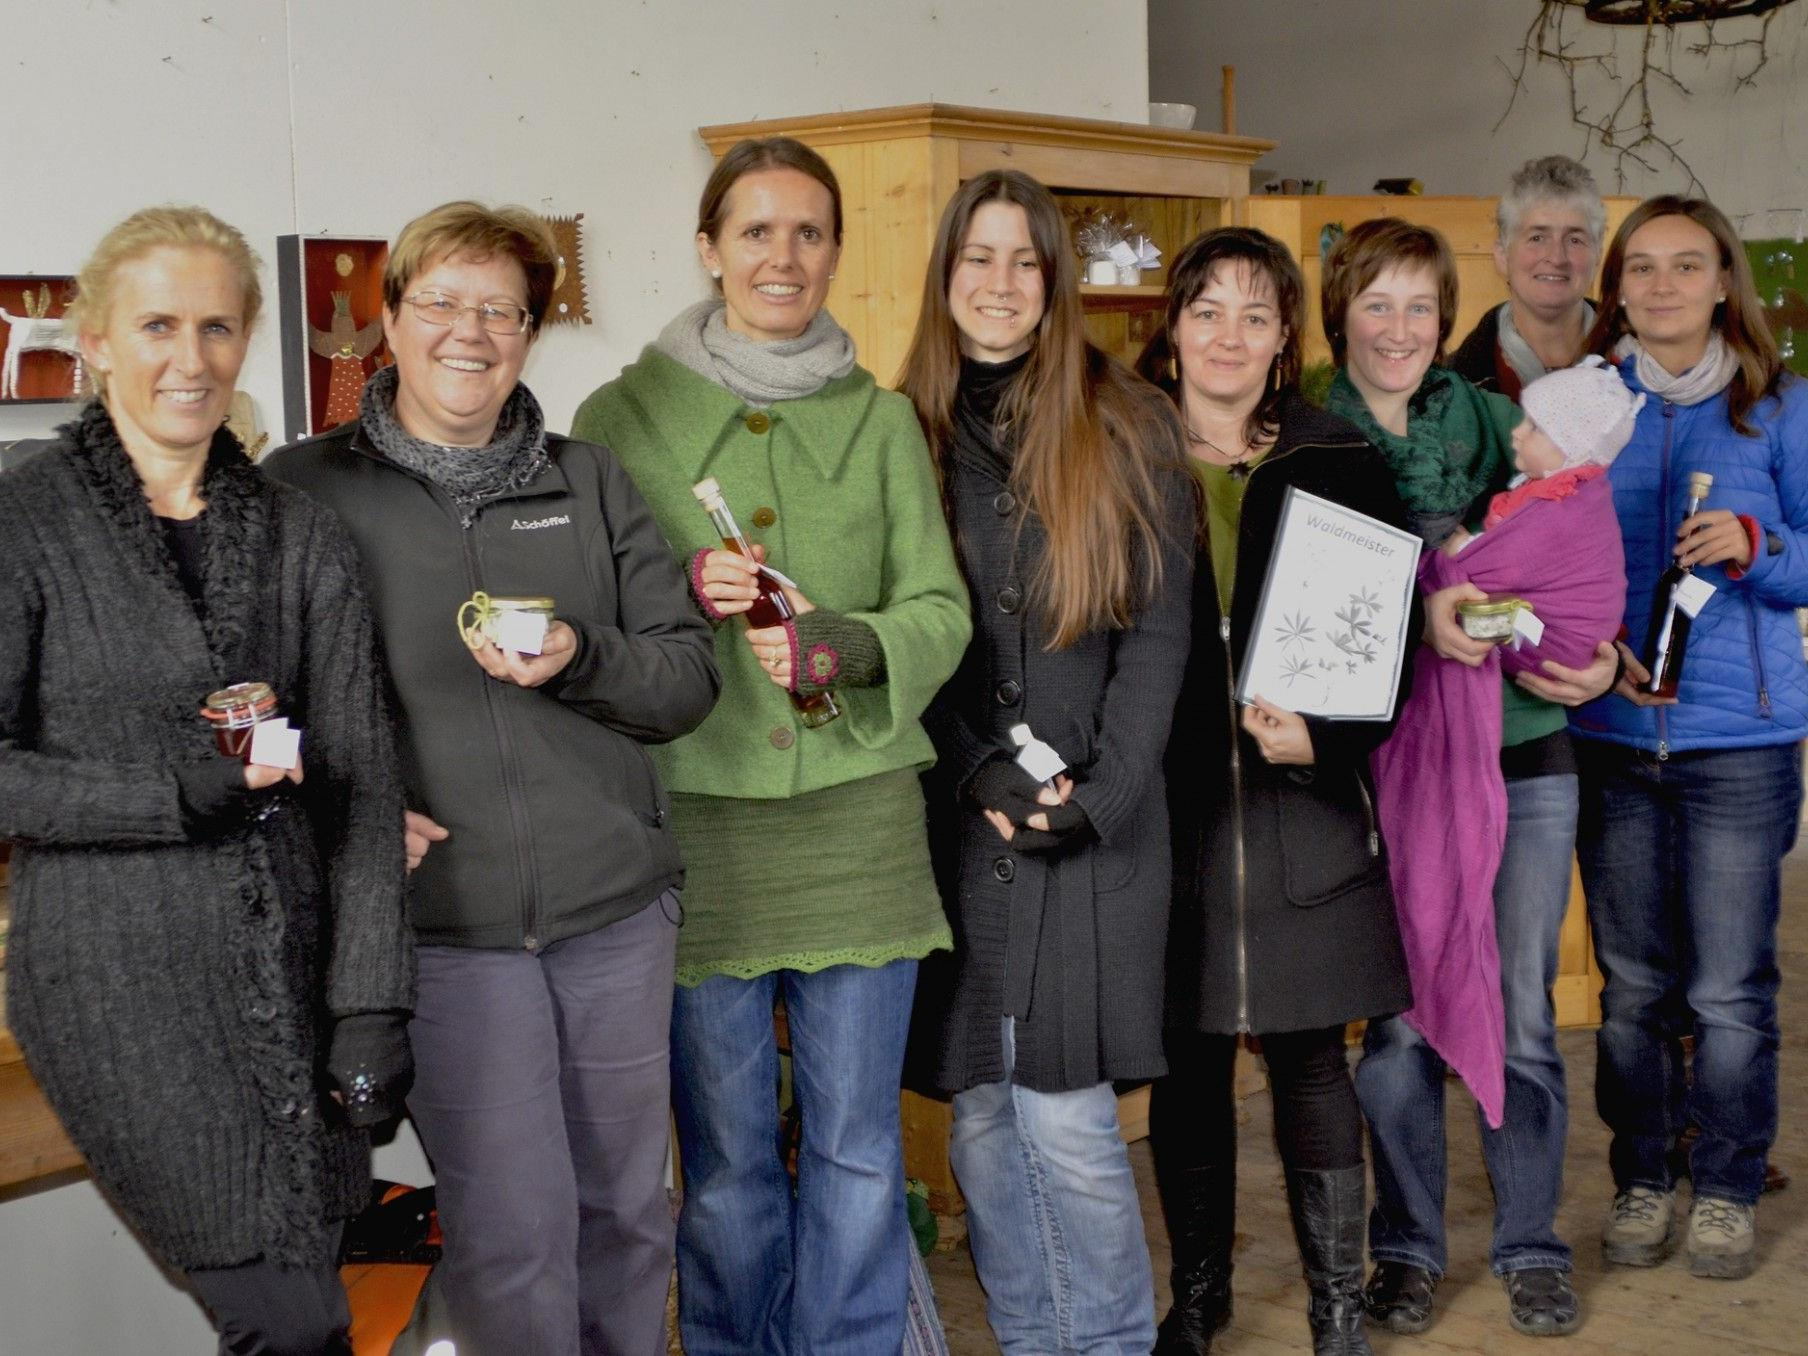 Einige der Kräuterpädagoginnen im Meininger Kronensaal.